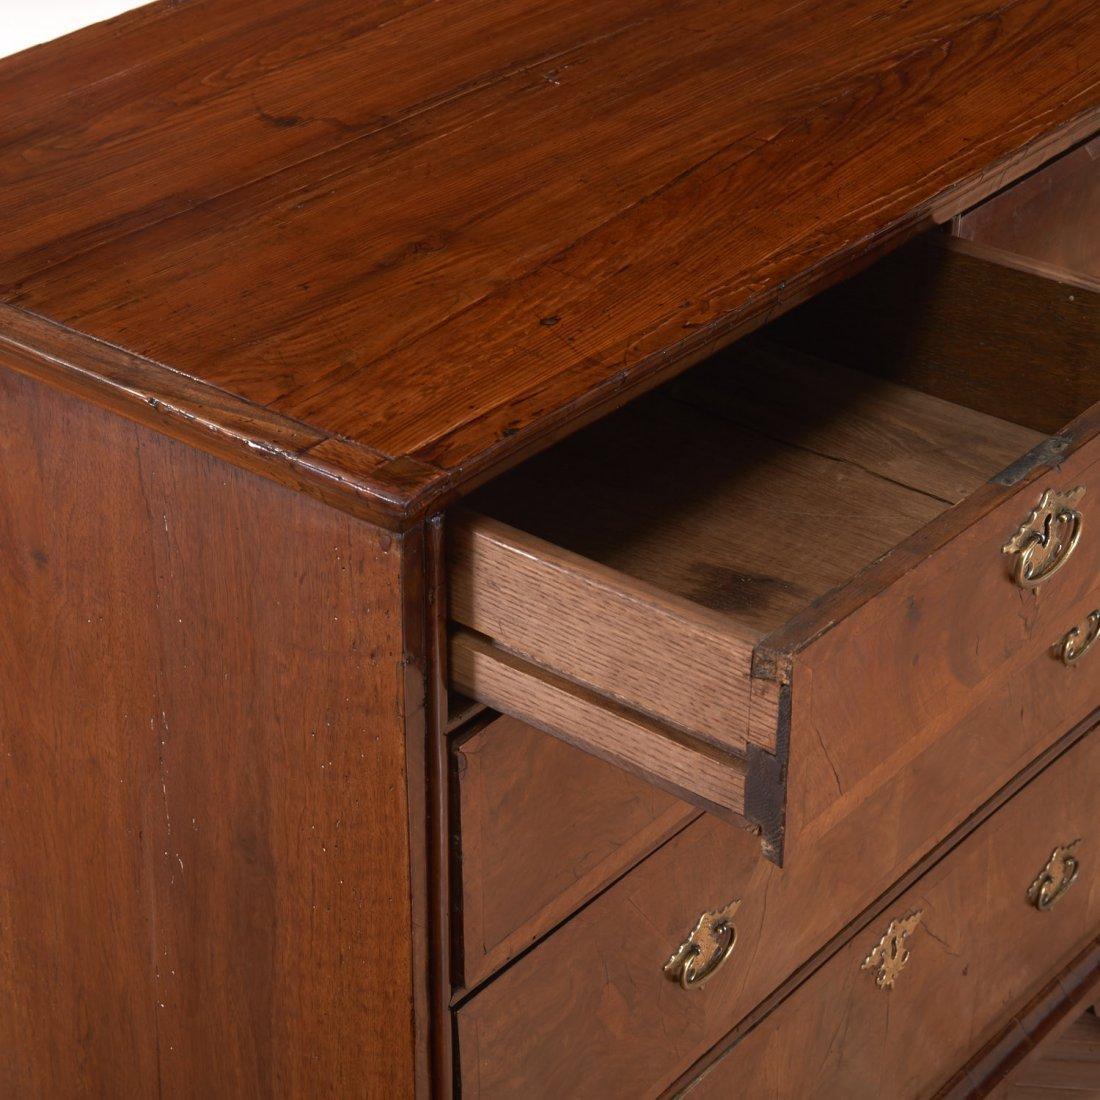 George II burled walnut chest of drawers - 4